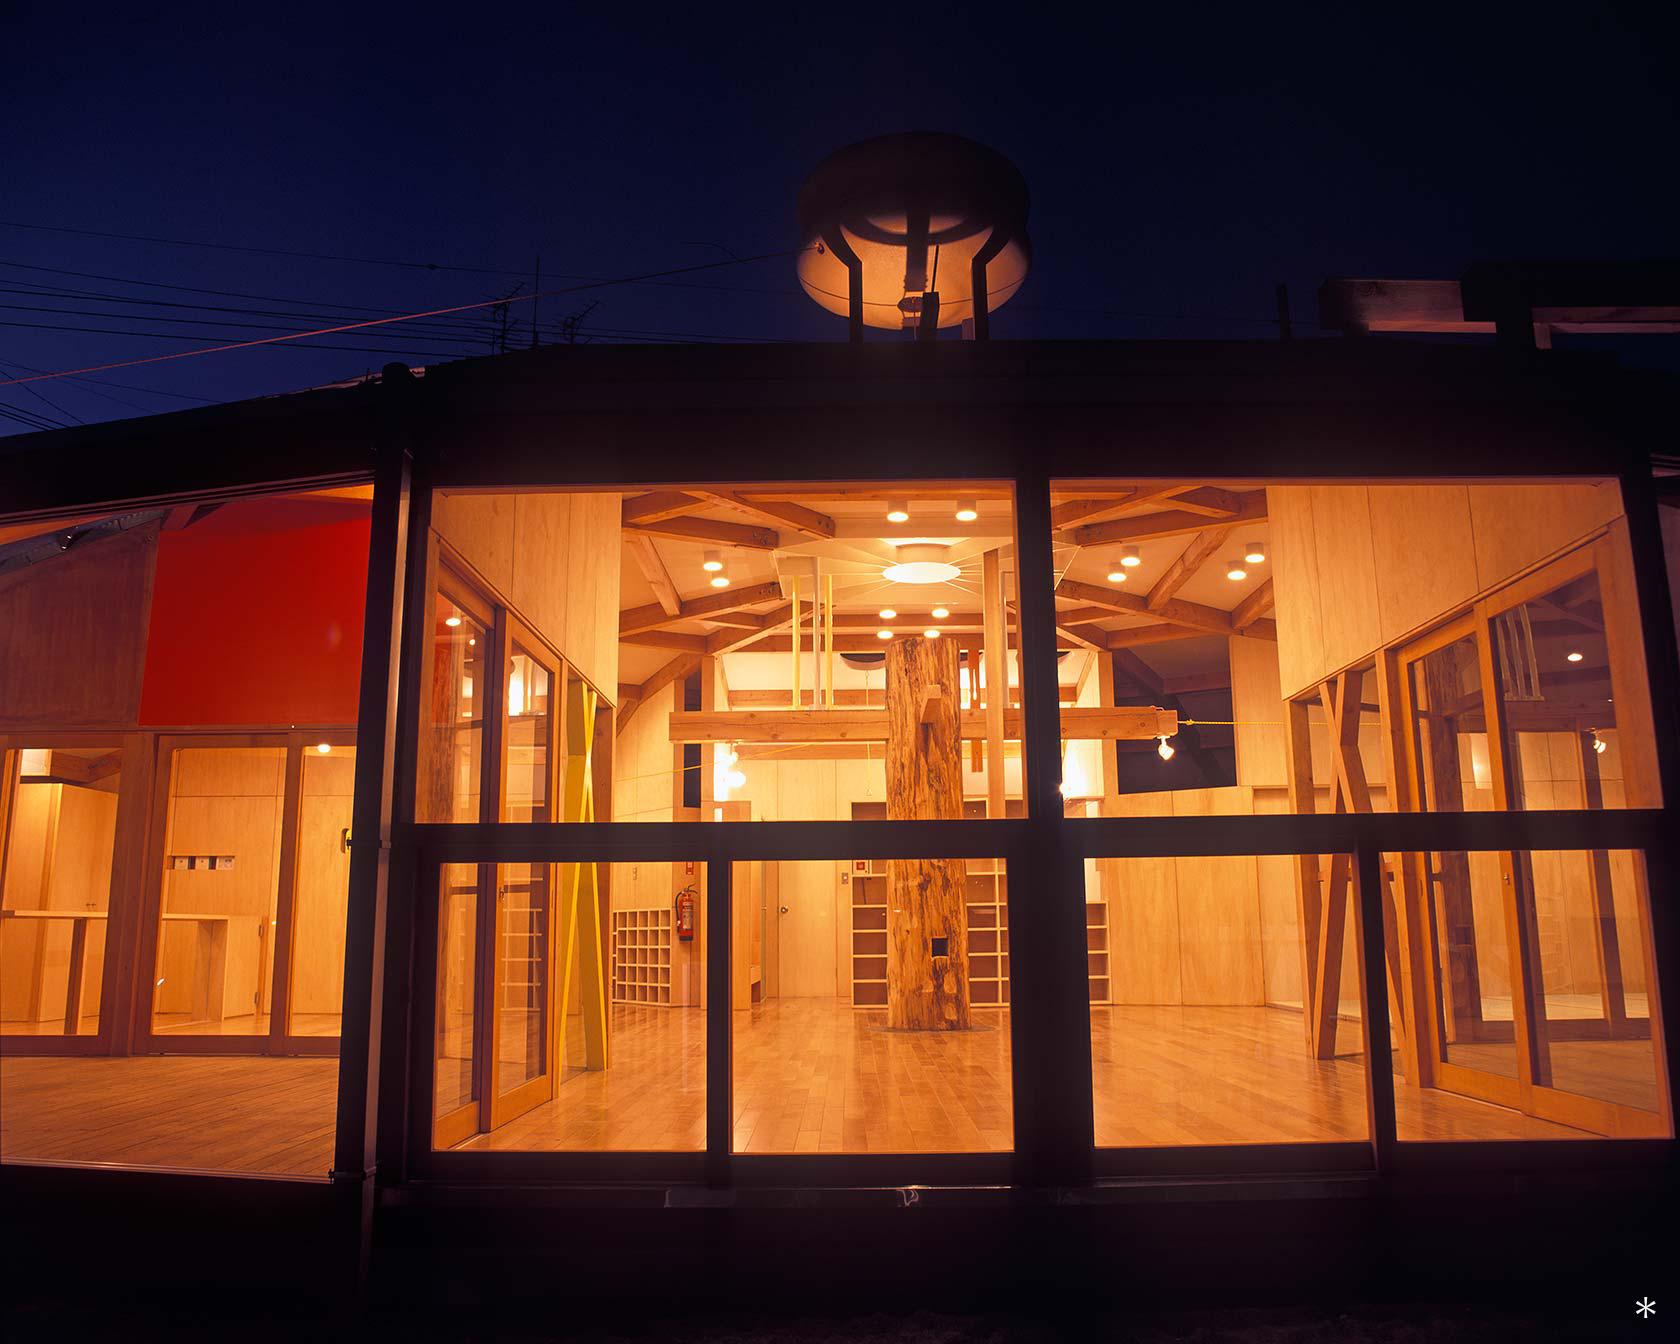 A保育センター16-どろんこ棟 夜景